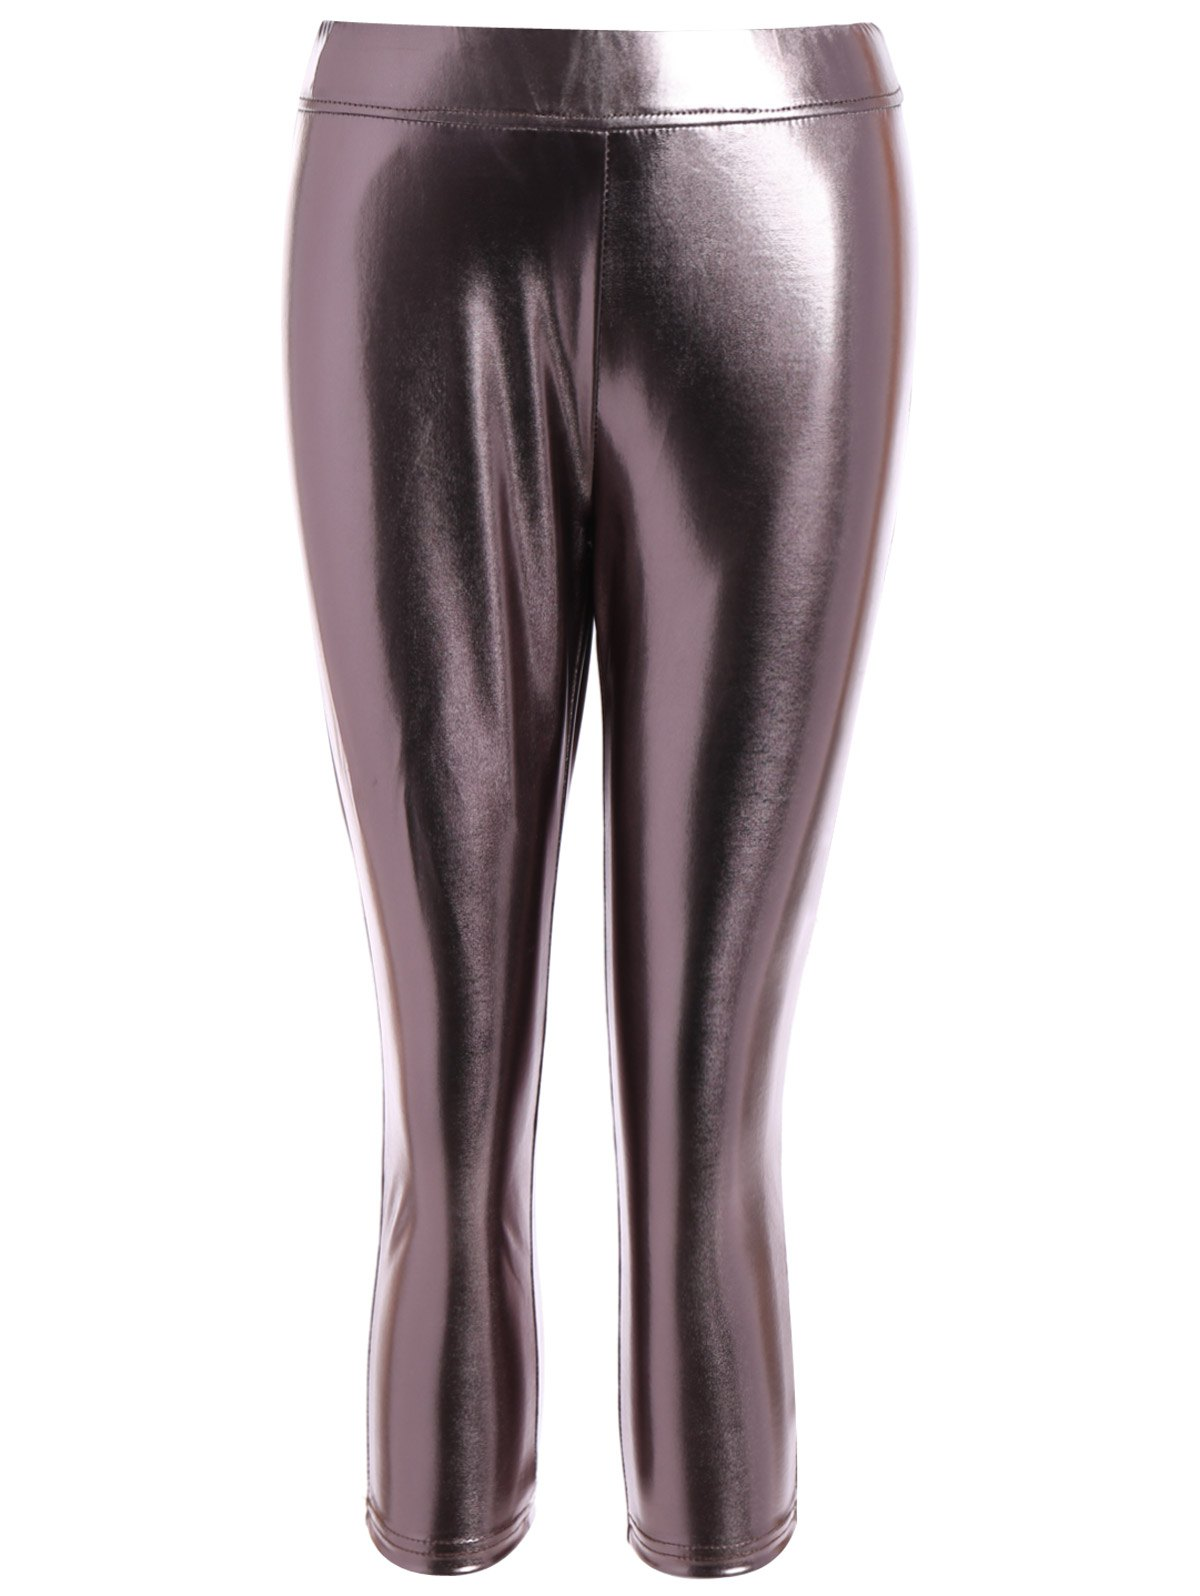 Metallic Color LeggingsClothes<br><br><br>Size: 2XL<br>Color: METALLIC